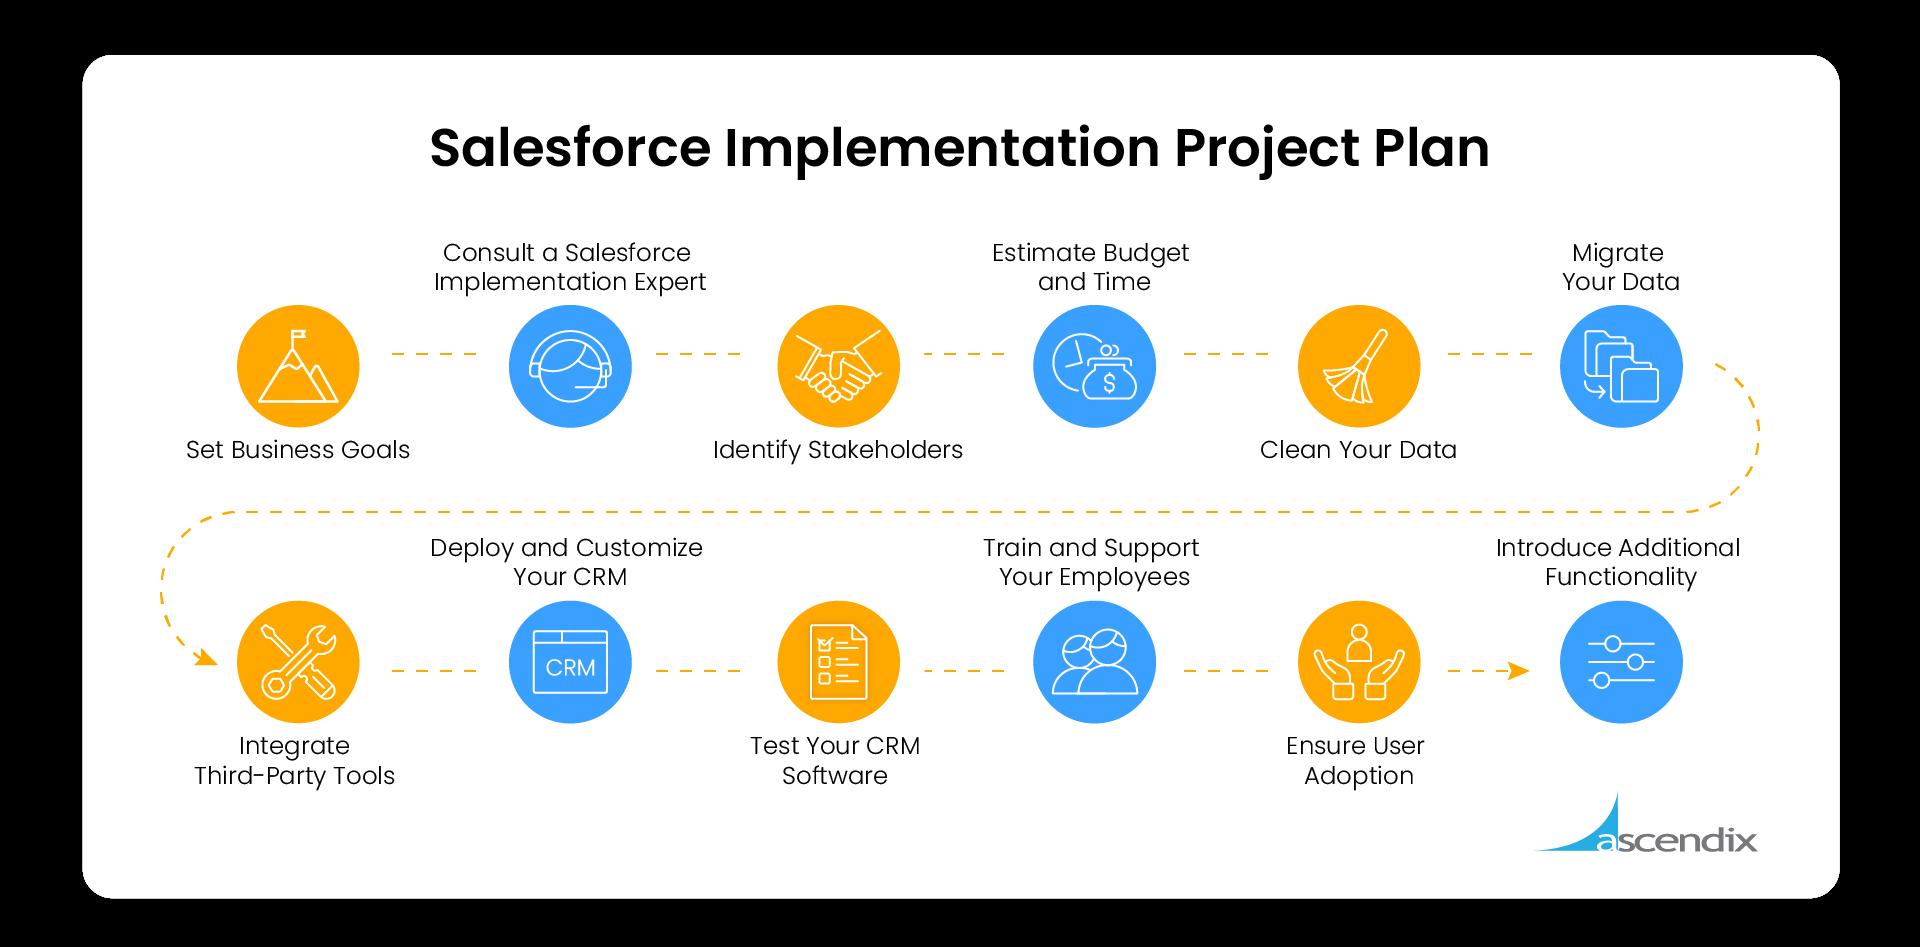 Salesforce Implementation Project Plan